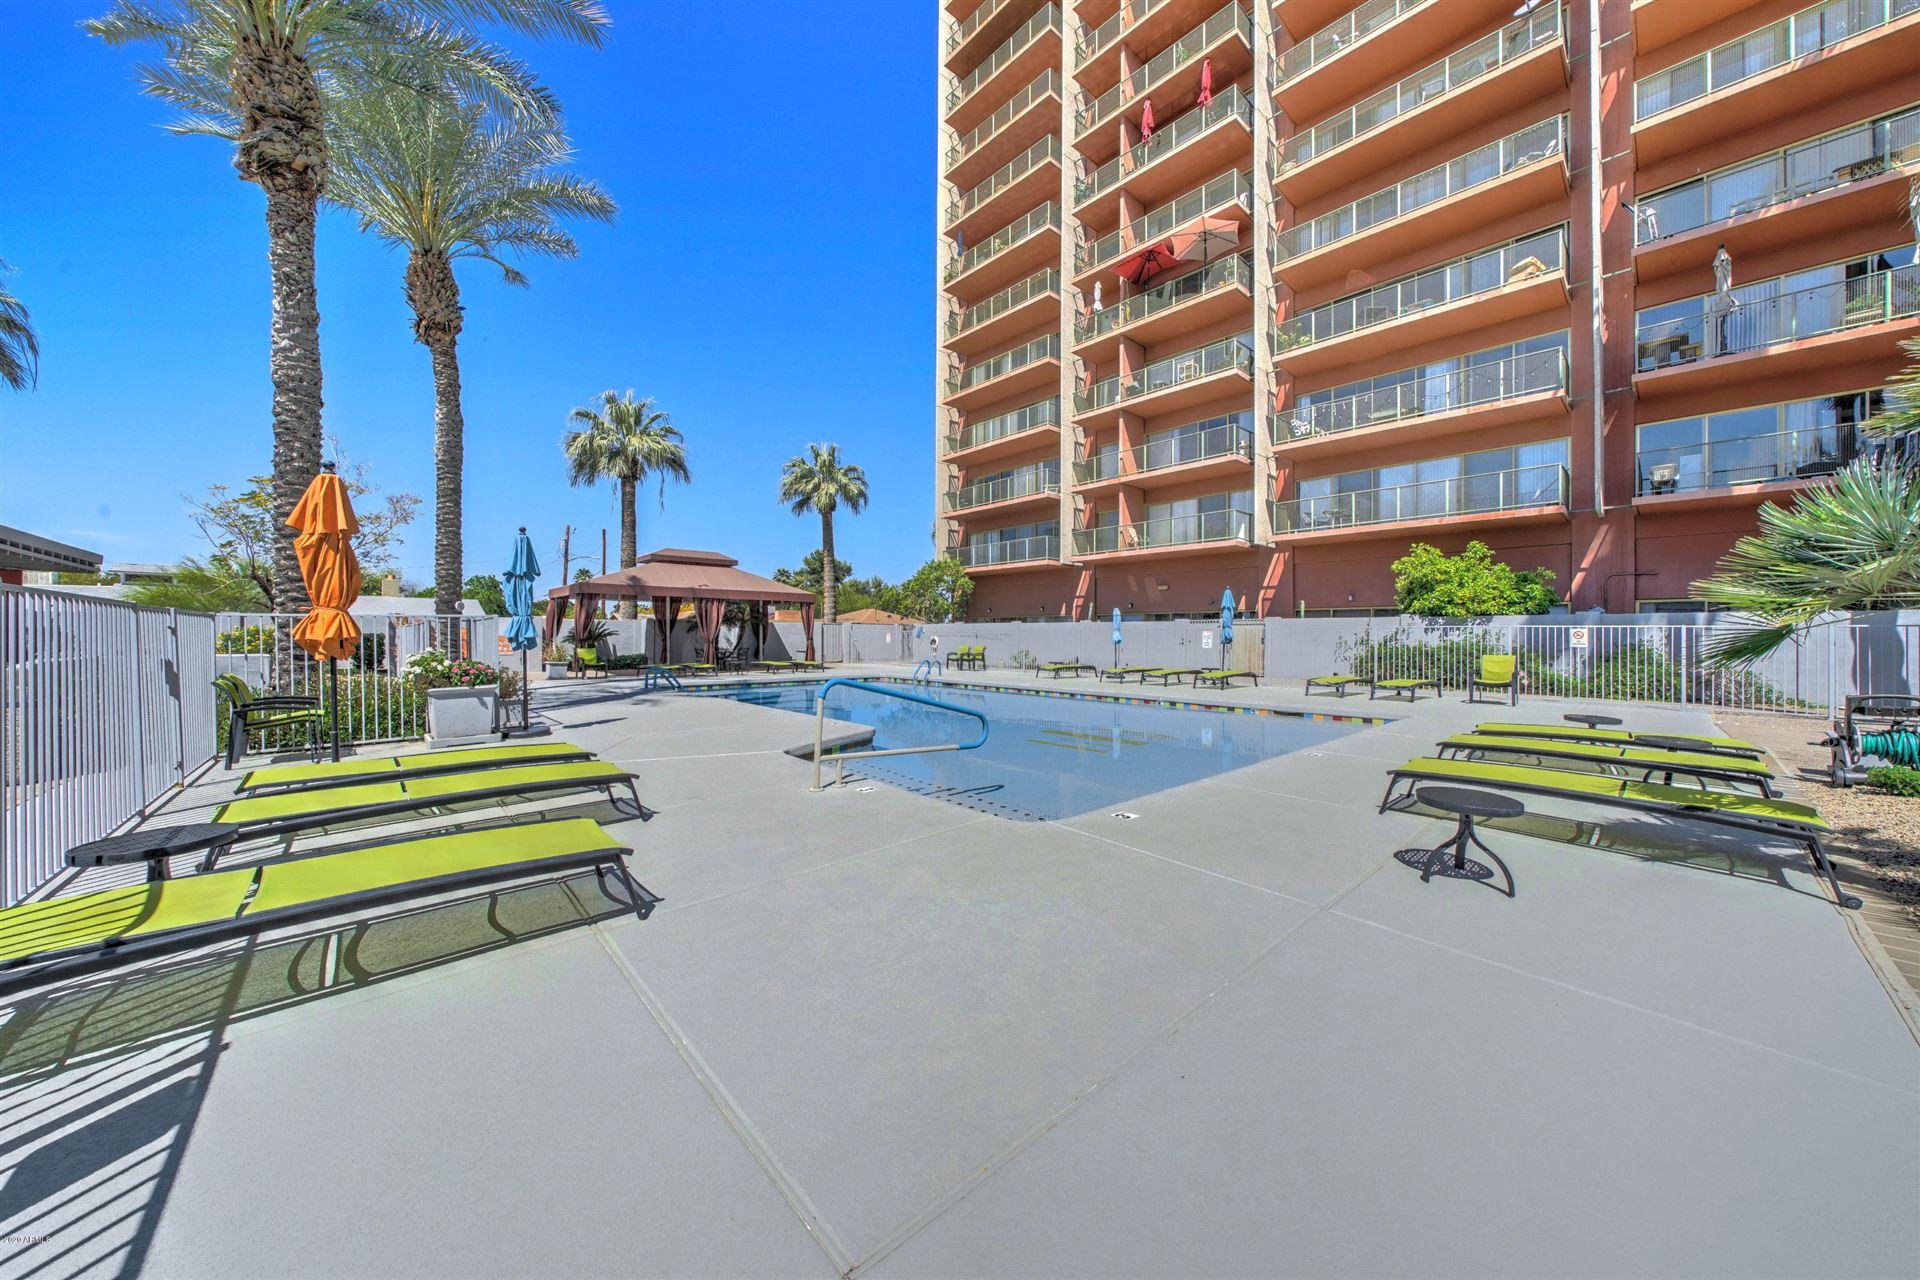 4750 N CENTRAL Avenue #5R, Phoenix, AZ 85012 - MLS#: 6179222